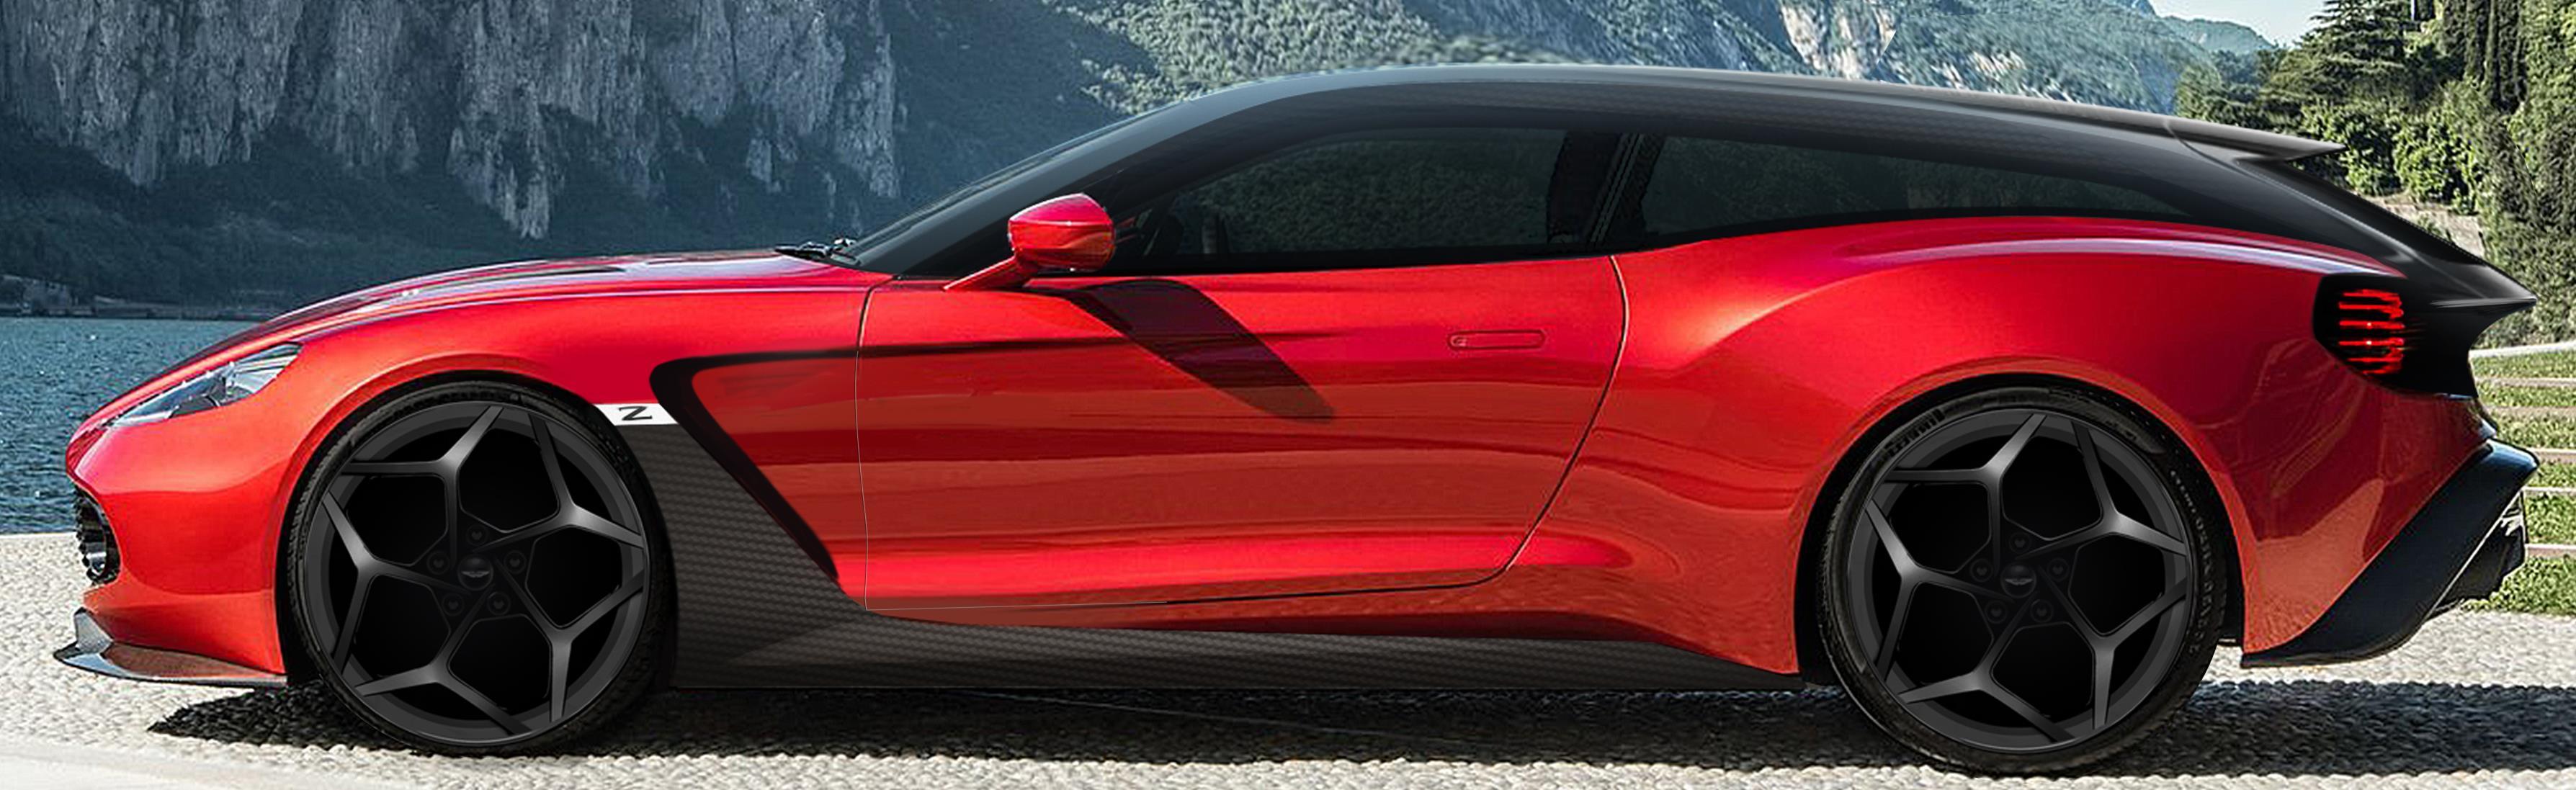 Aston Martin Vanquish Zagato Shooting Brake Joins Speedster Volante Coupe Autoevolution